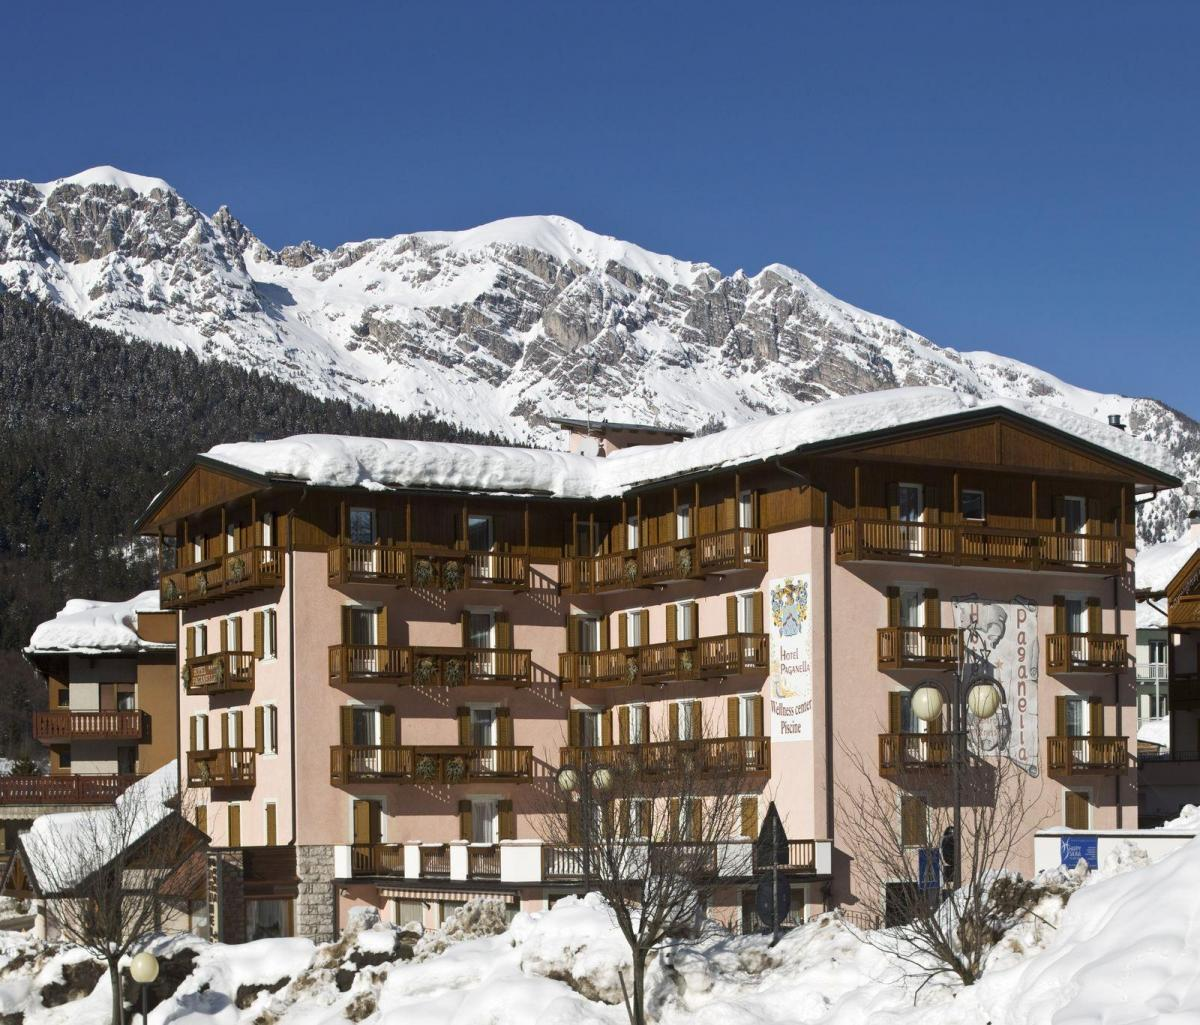 Hotel Paganella Inverno